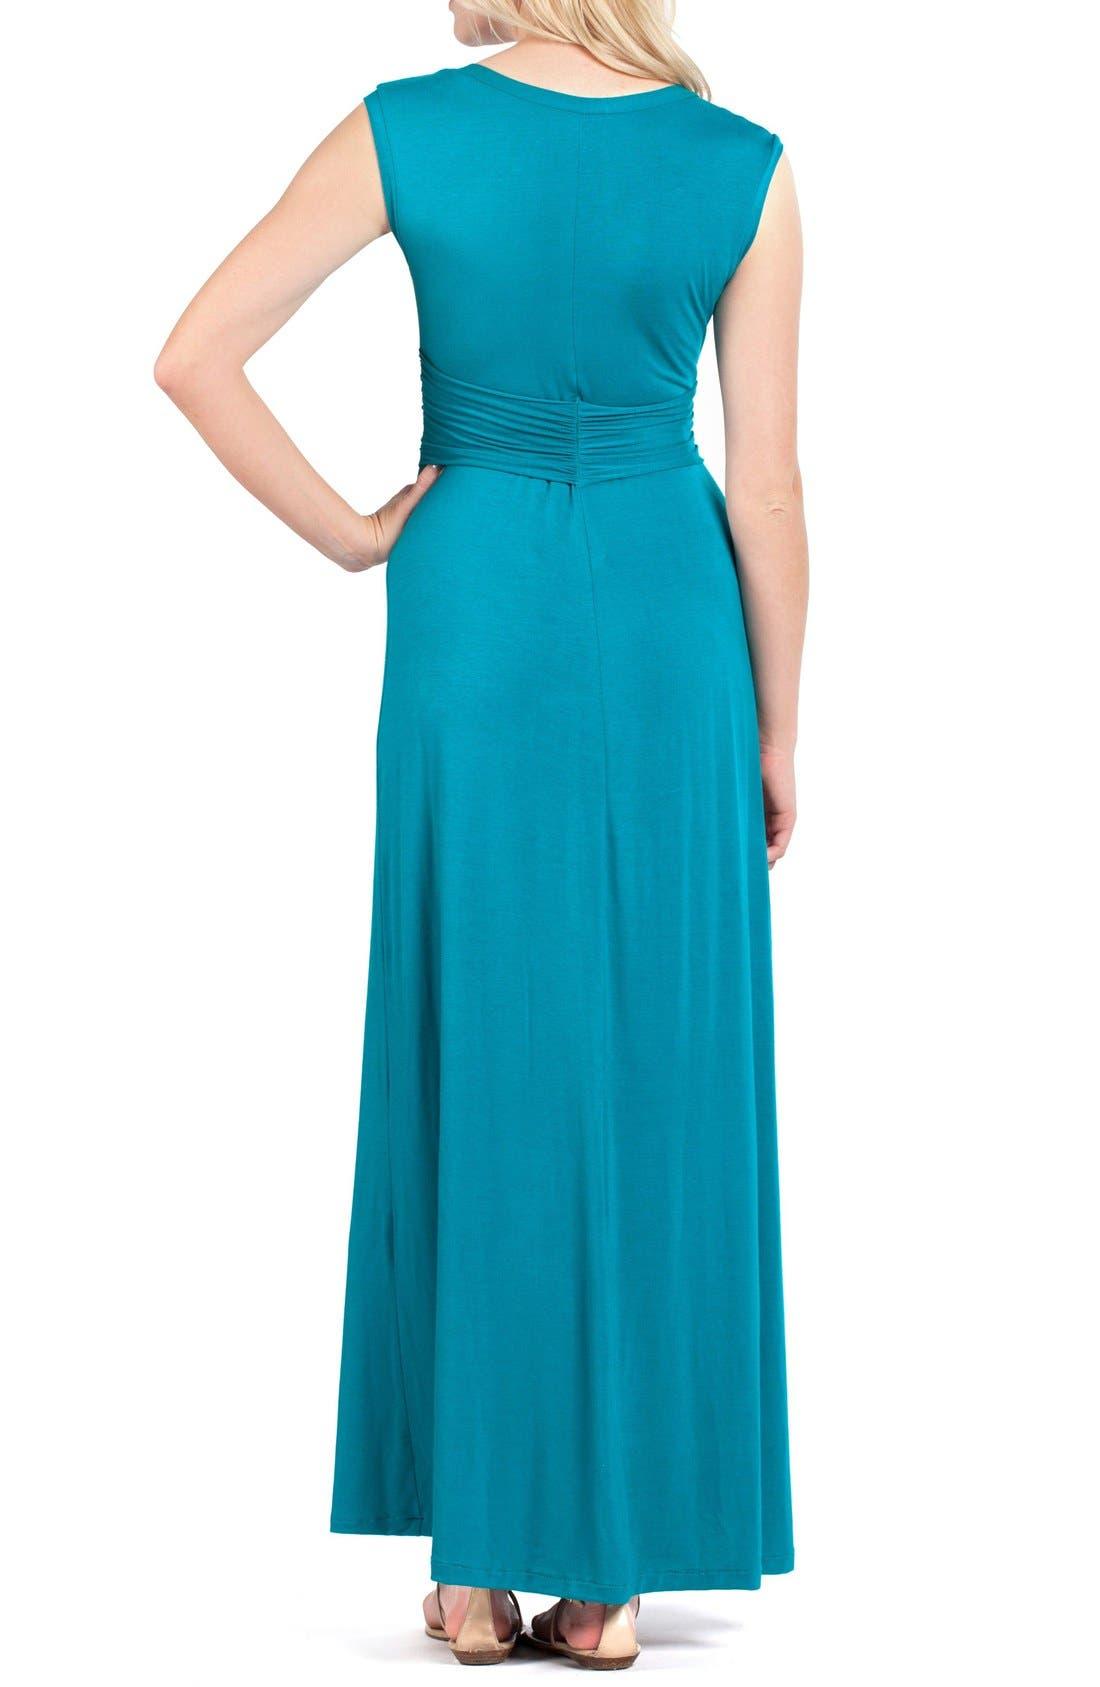 Athens Maternity/Nursing Maxi Dress,                             Alternate thumbnail 3, color,                             JADE